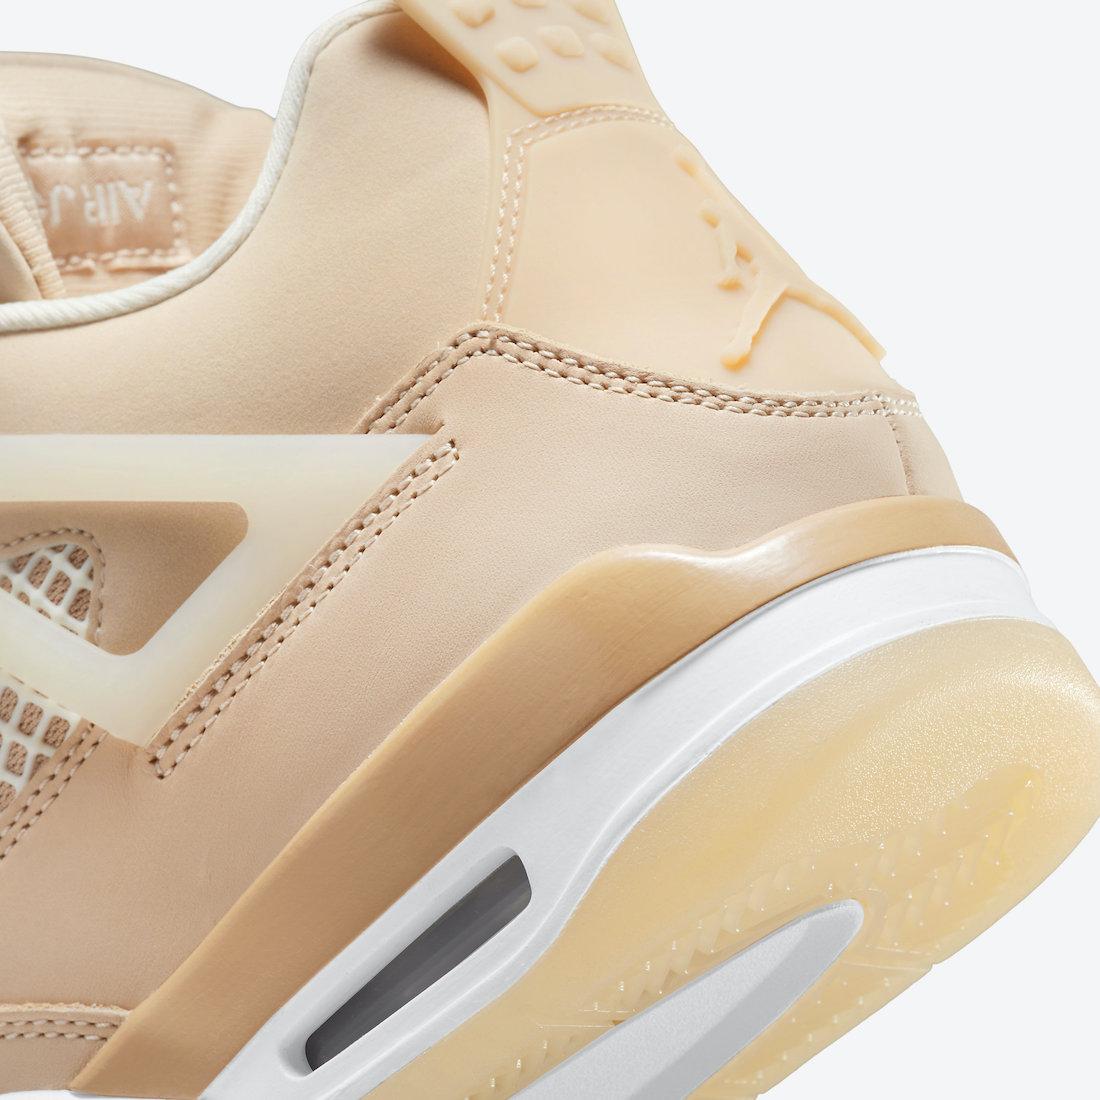 Air-Jordan-4-Shimmer-WMNS-DJ0675-200-Release-Date-Price-7